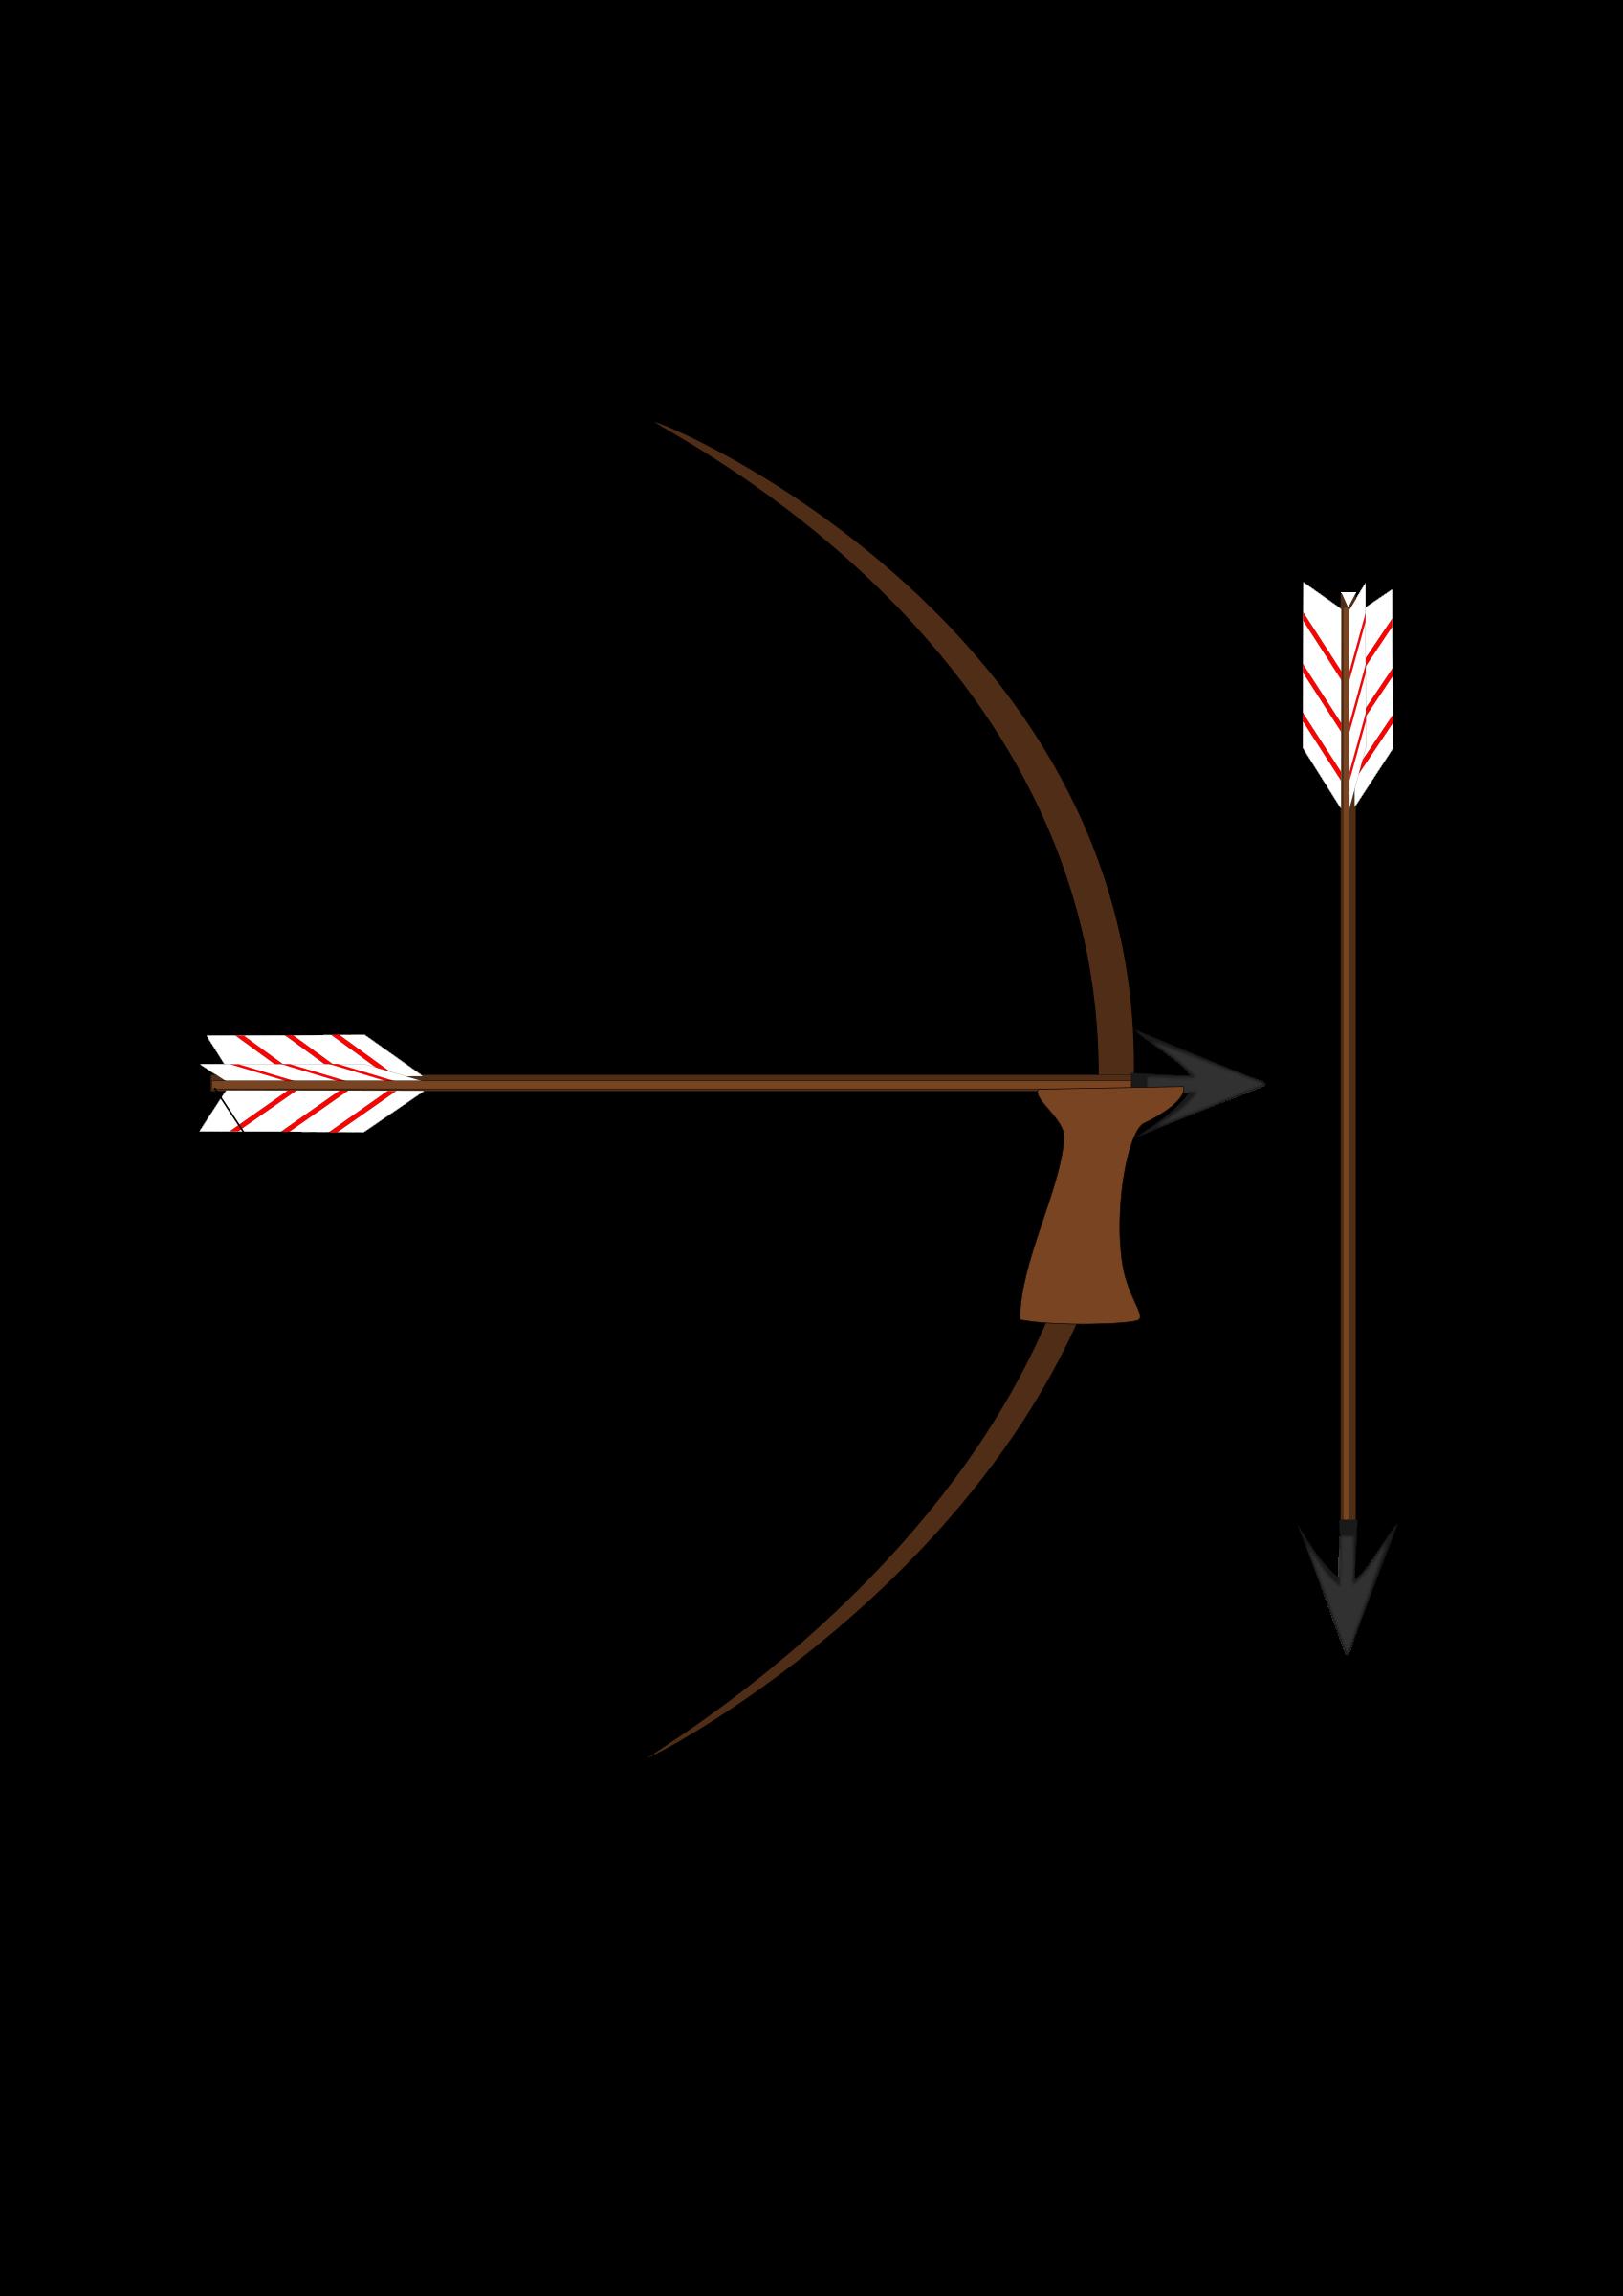 Bows clipart archery. Bow and arrow big